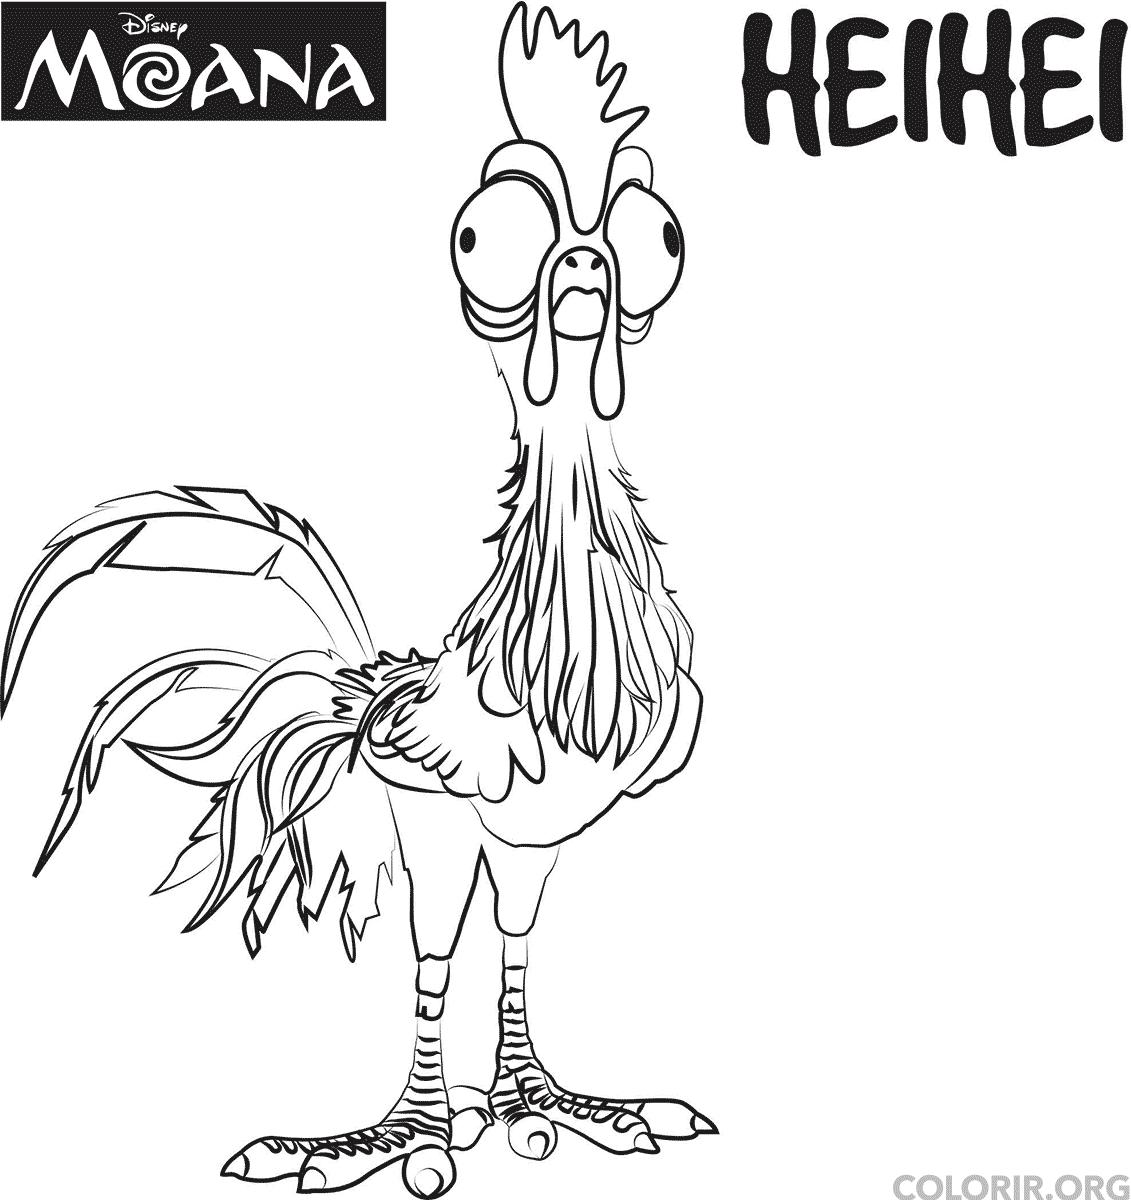 heihei o galo de moana para colorir online colorirorg sketch